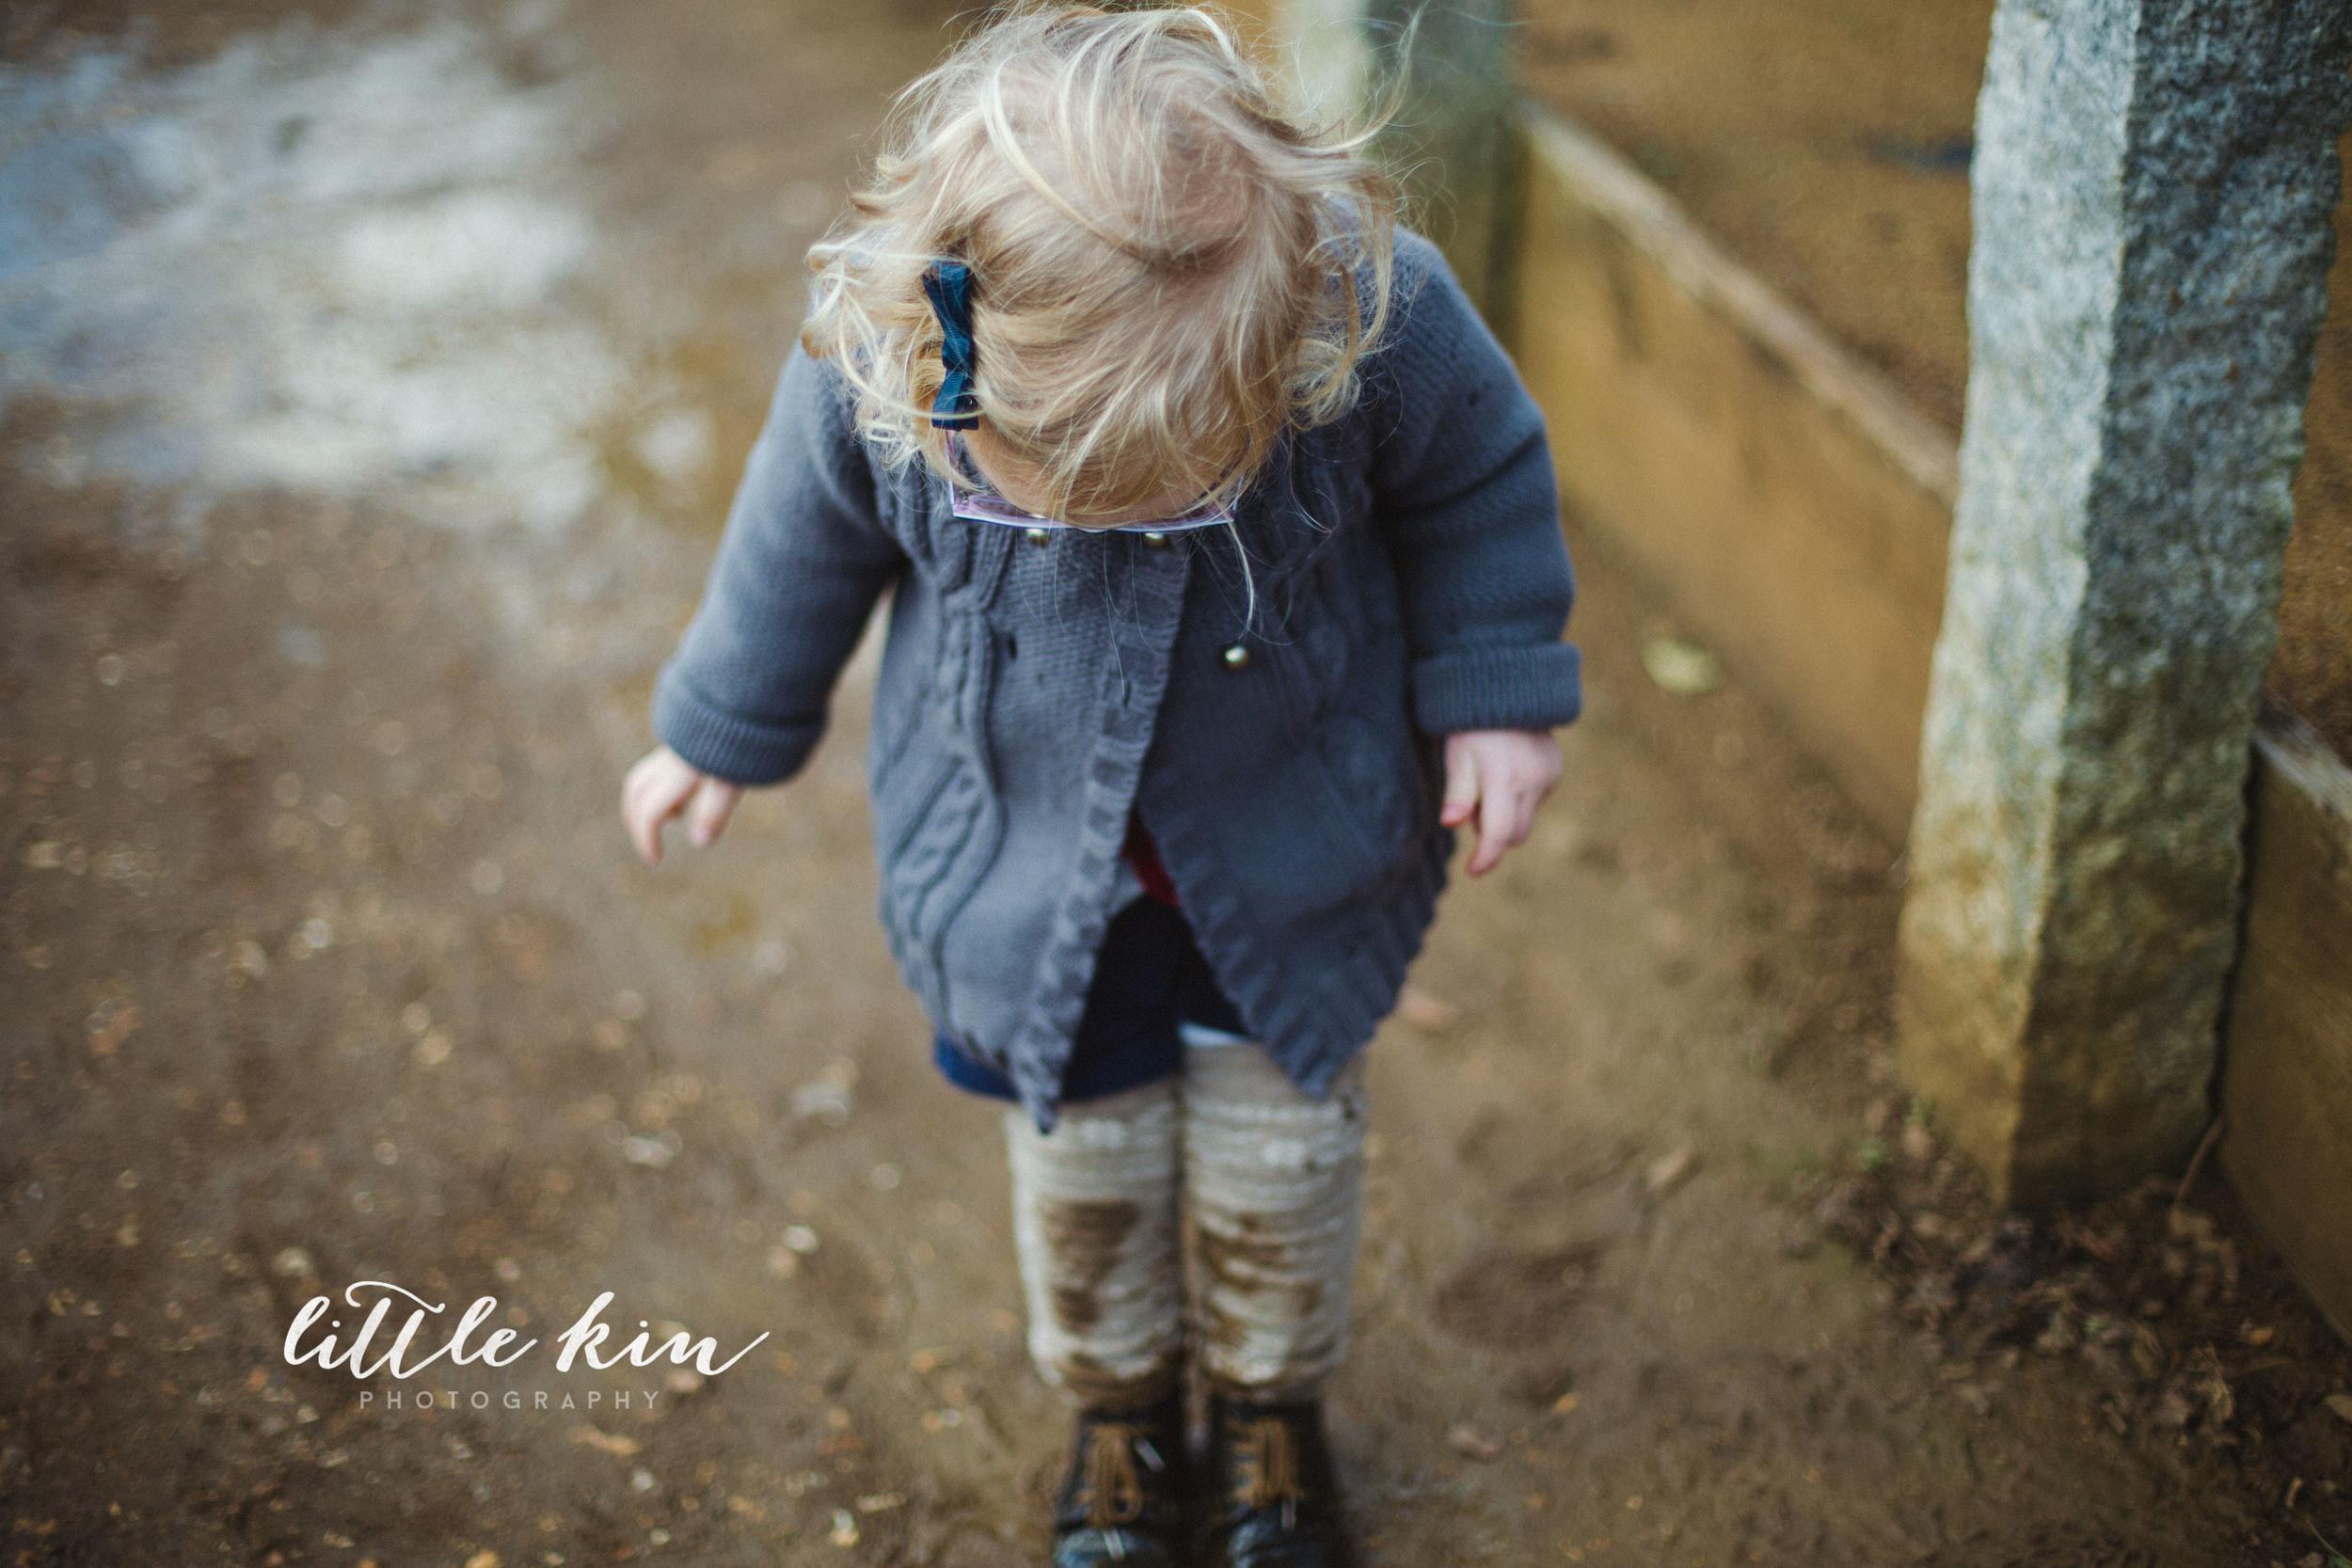 Love_LittleKinPhotography_media-7.jpg